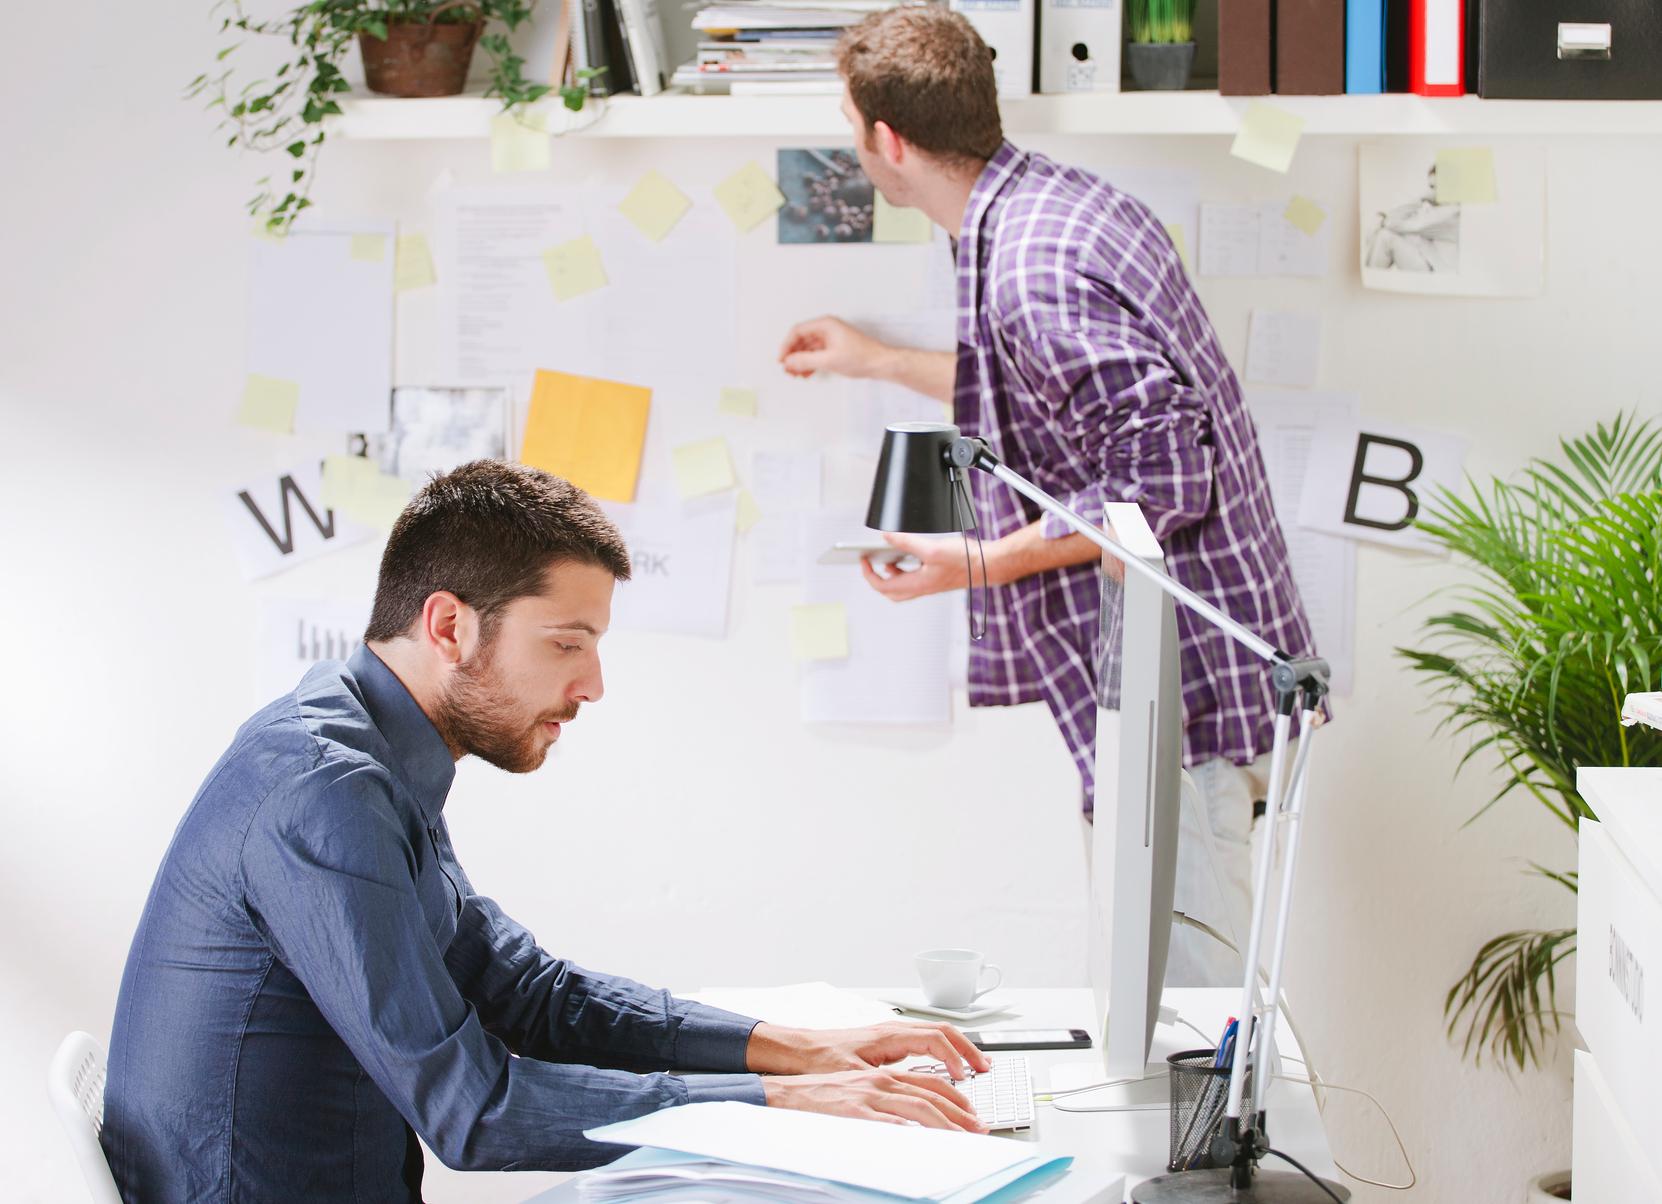 идея знакомство бизнес